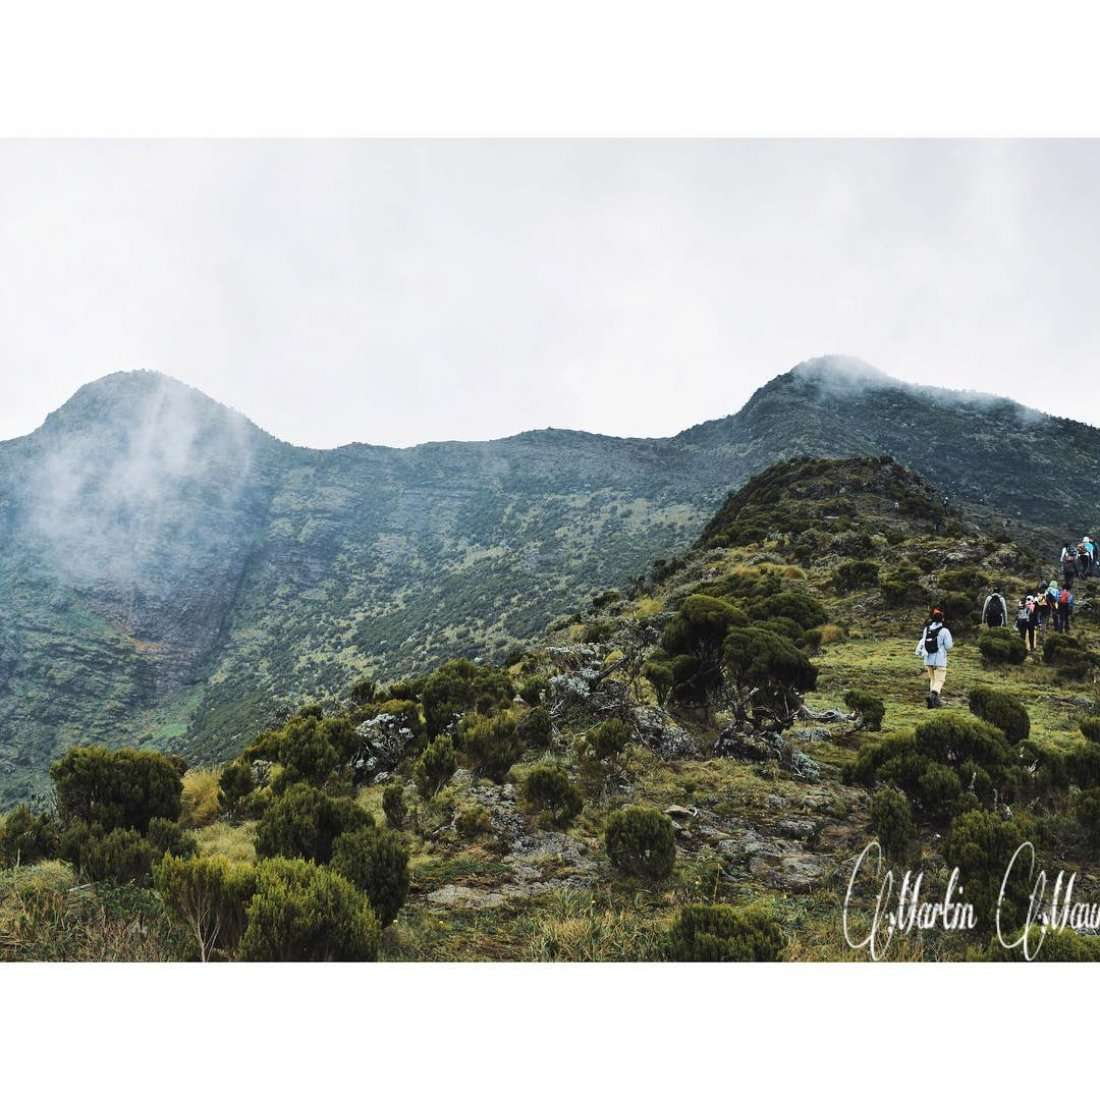 Aberdare Elephant hill Mt Kenya preparation hike